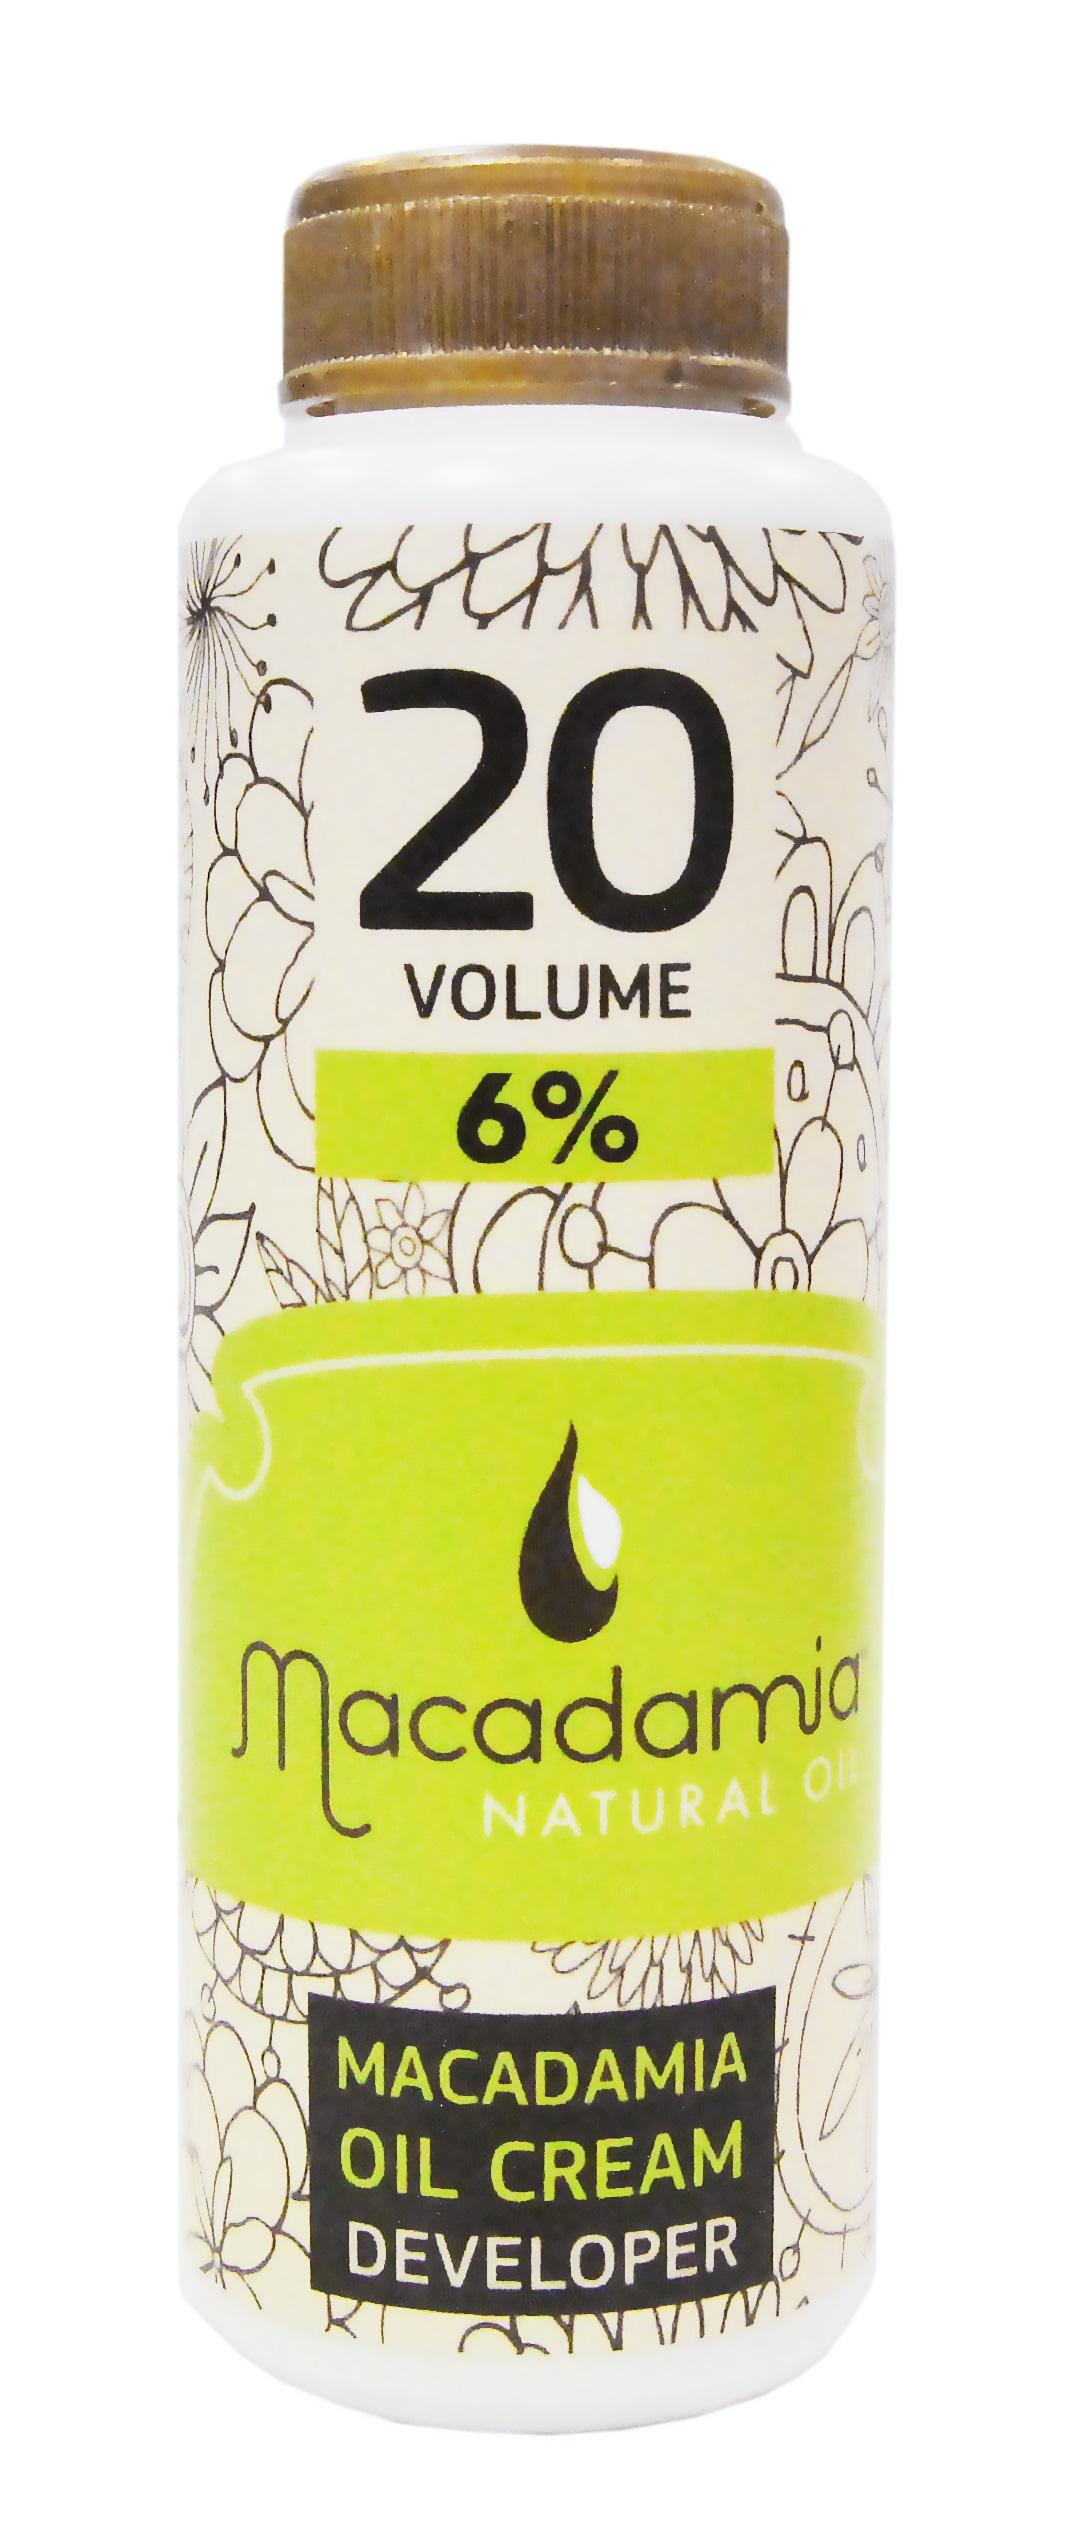 MACADAMIA Natural Oil Окислитель 6% (20 vol) / Cream Color 100 мл